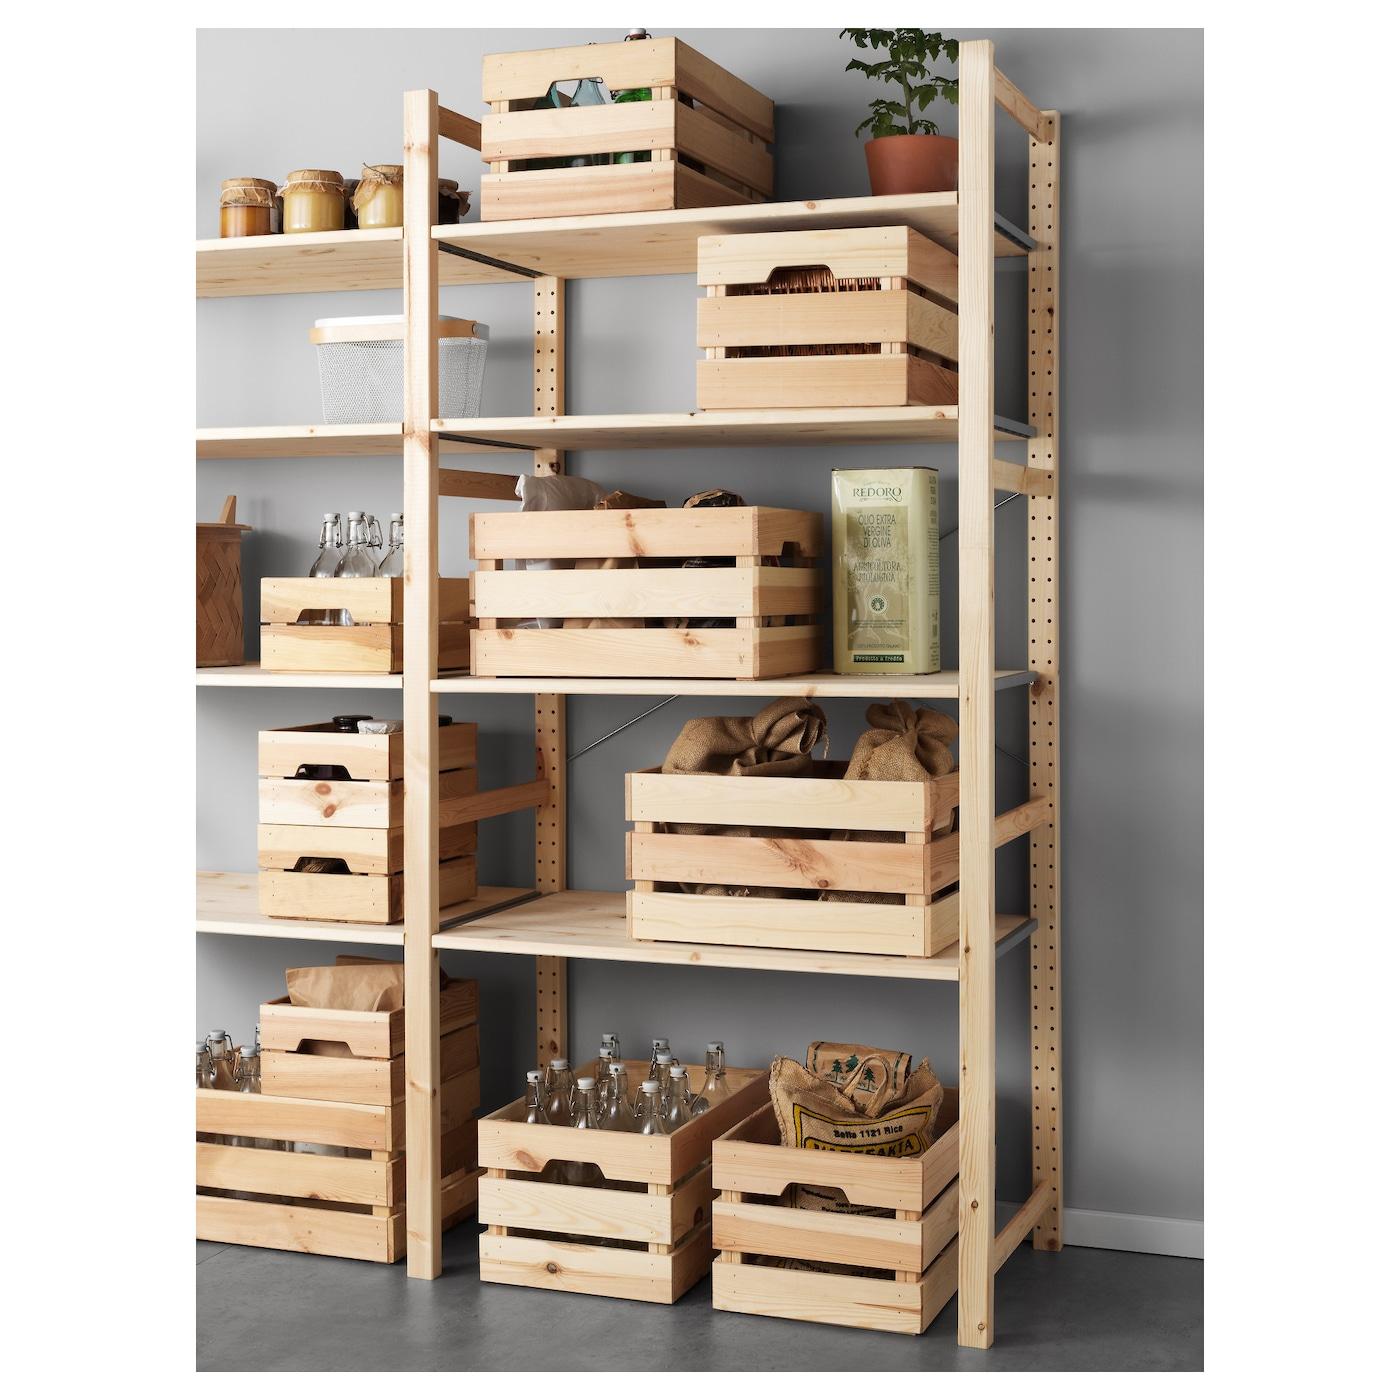 Knagglig Bo Te Pin 46x31x25 Cm Ikea # Etagere Cagette Bois